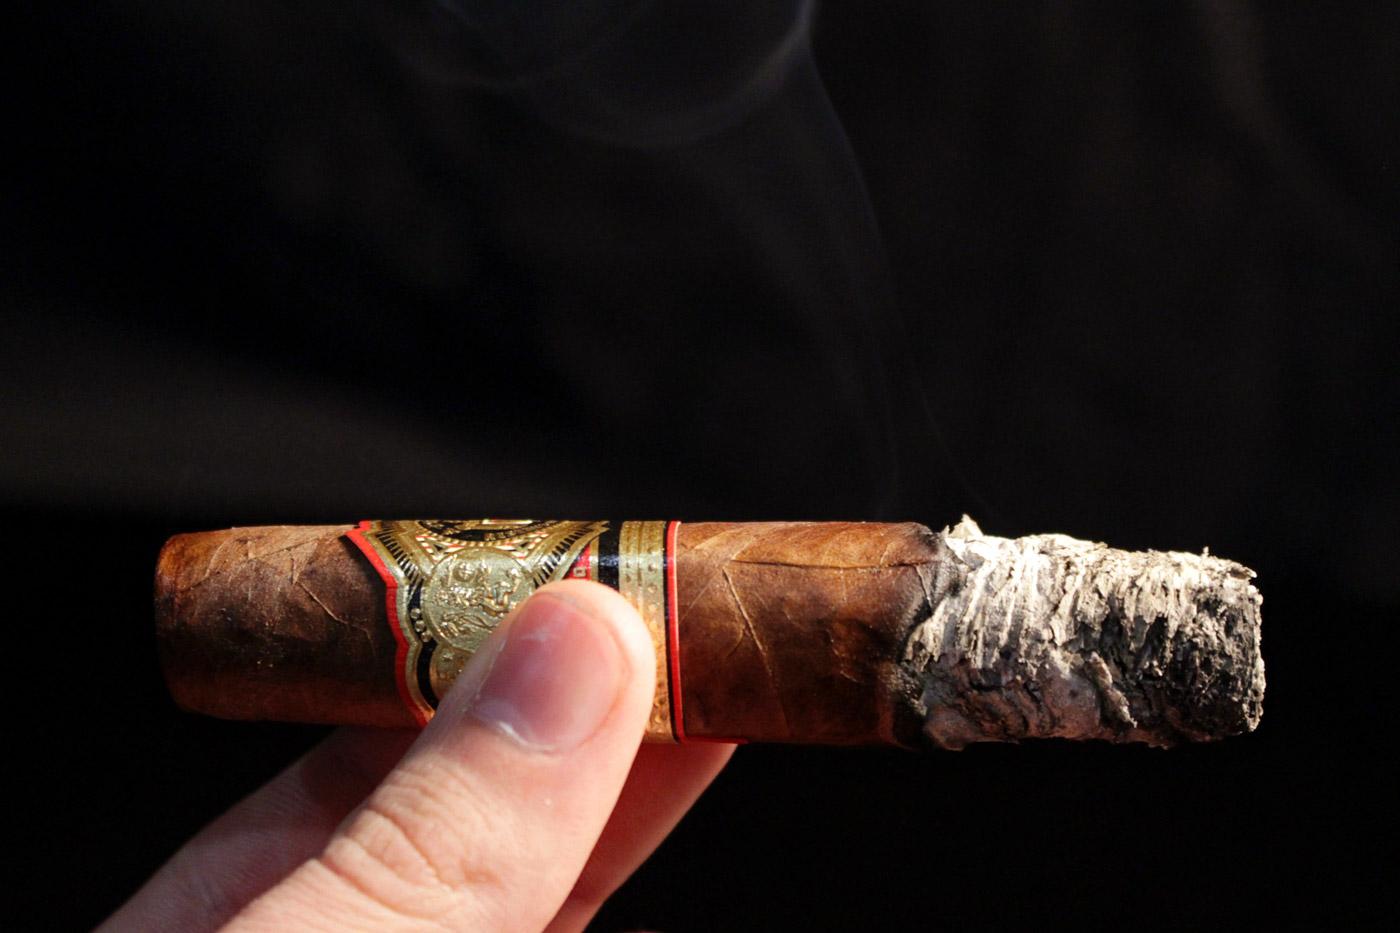 Arturo Fuente Don Carlos Eye of the Shark cigar review